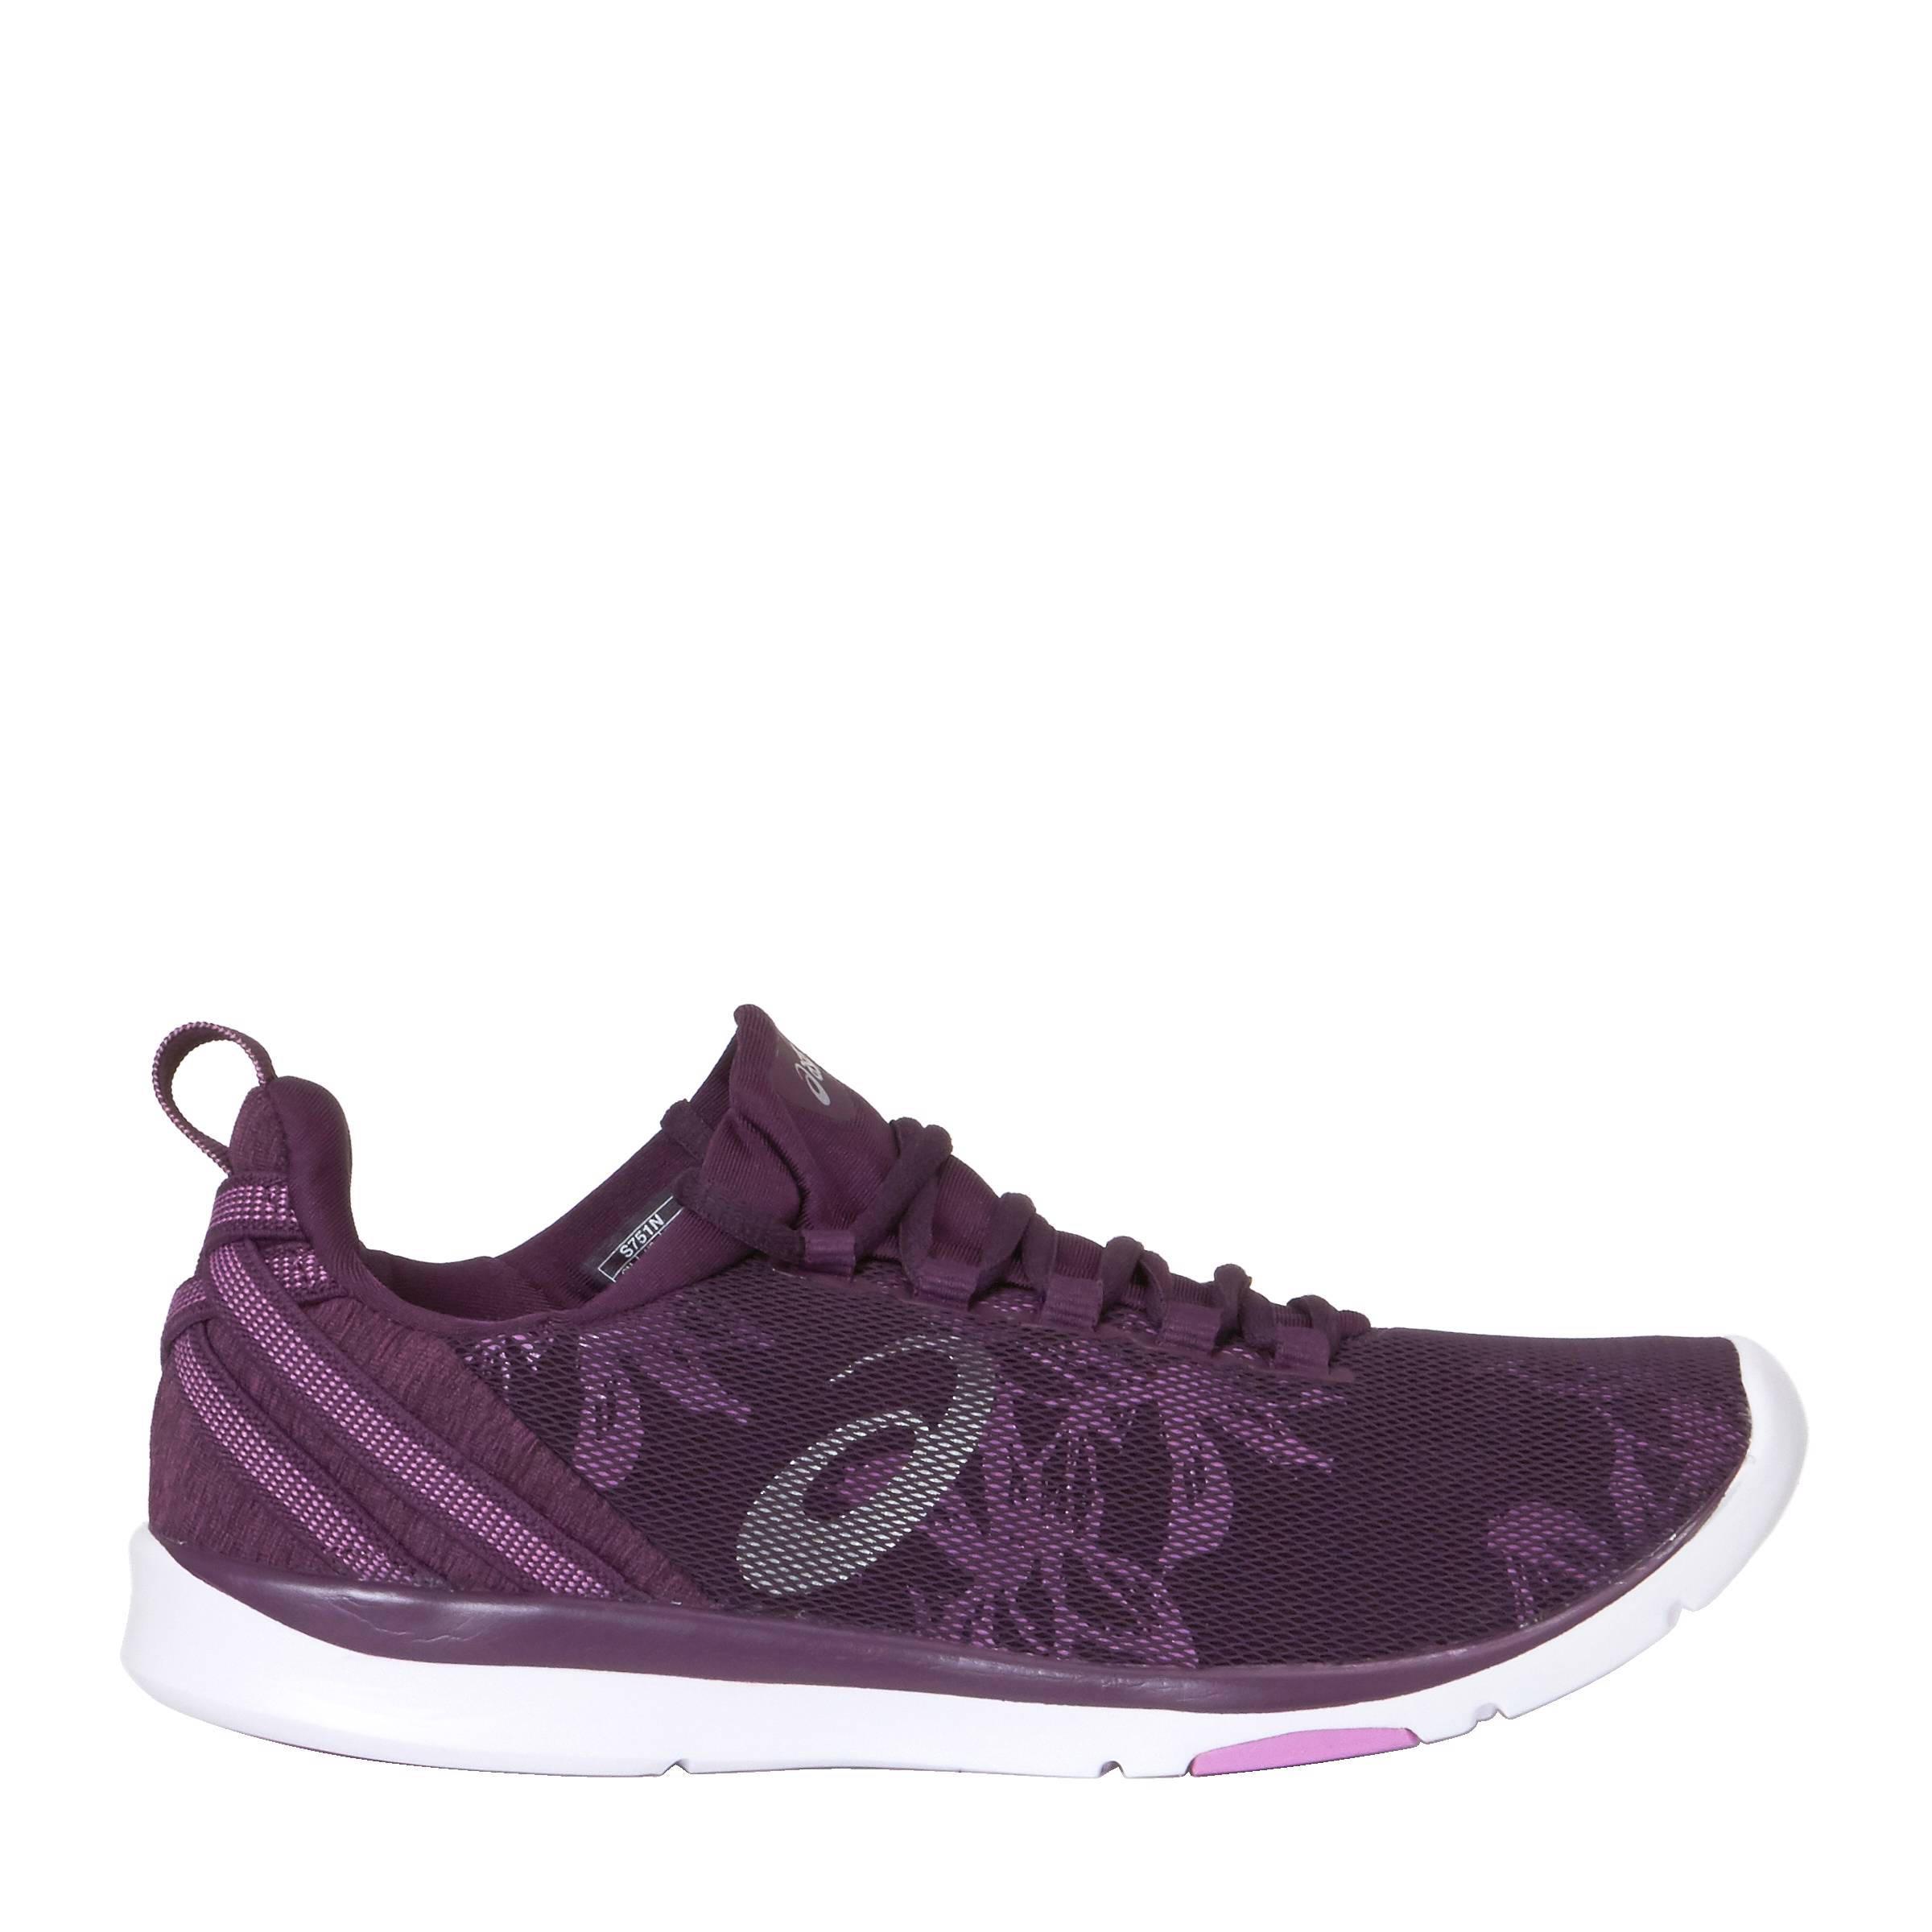 488a1368f98 ASICS Gel Fit Sana 2 fitness schoenen | wehkamp